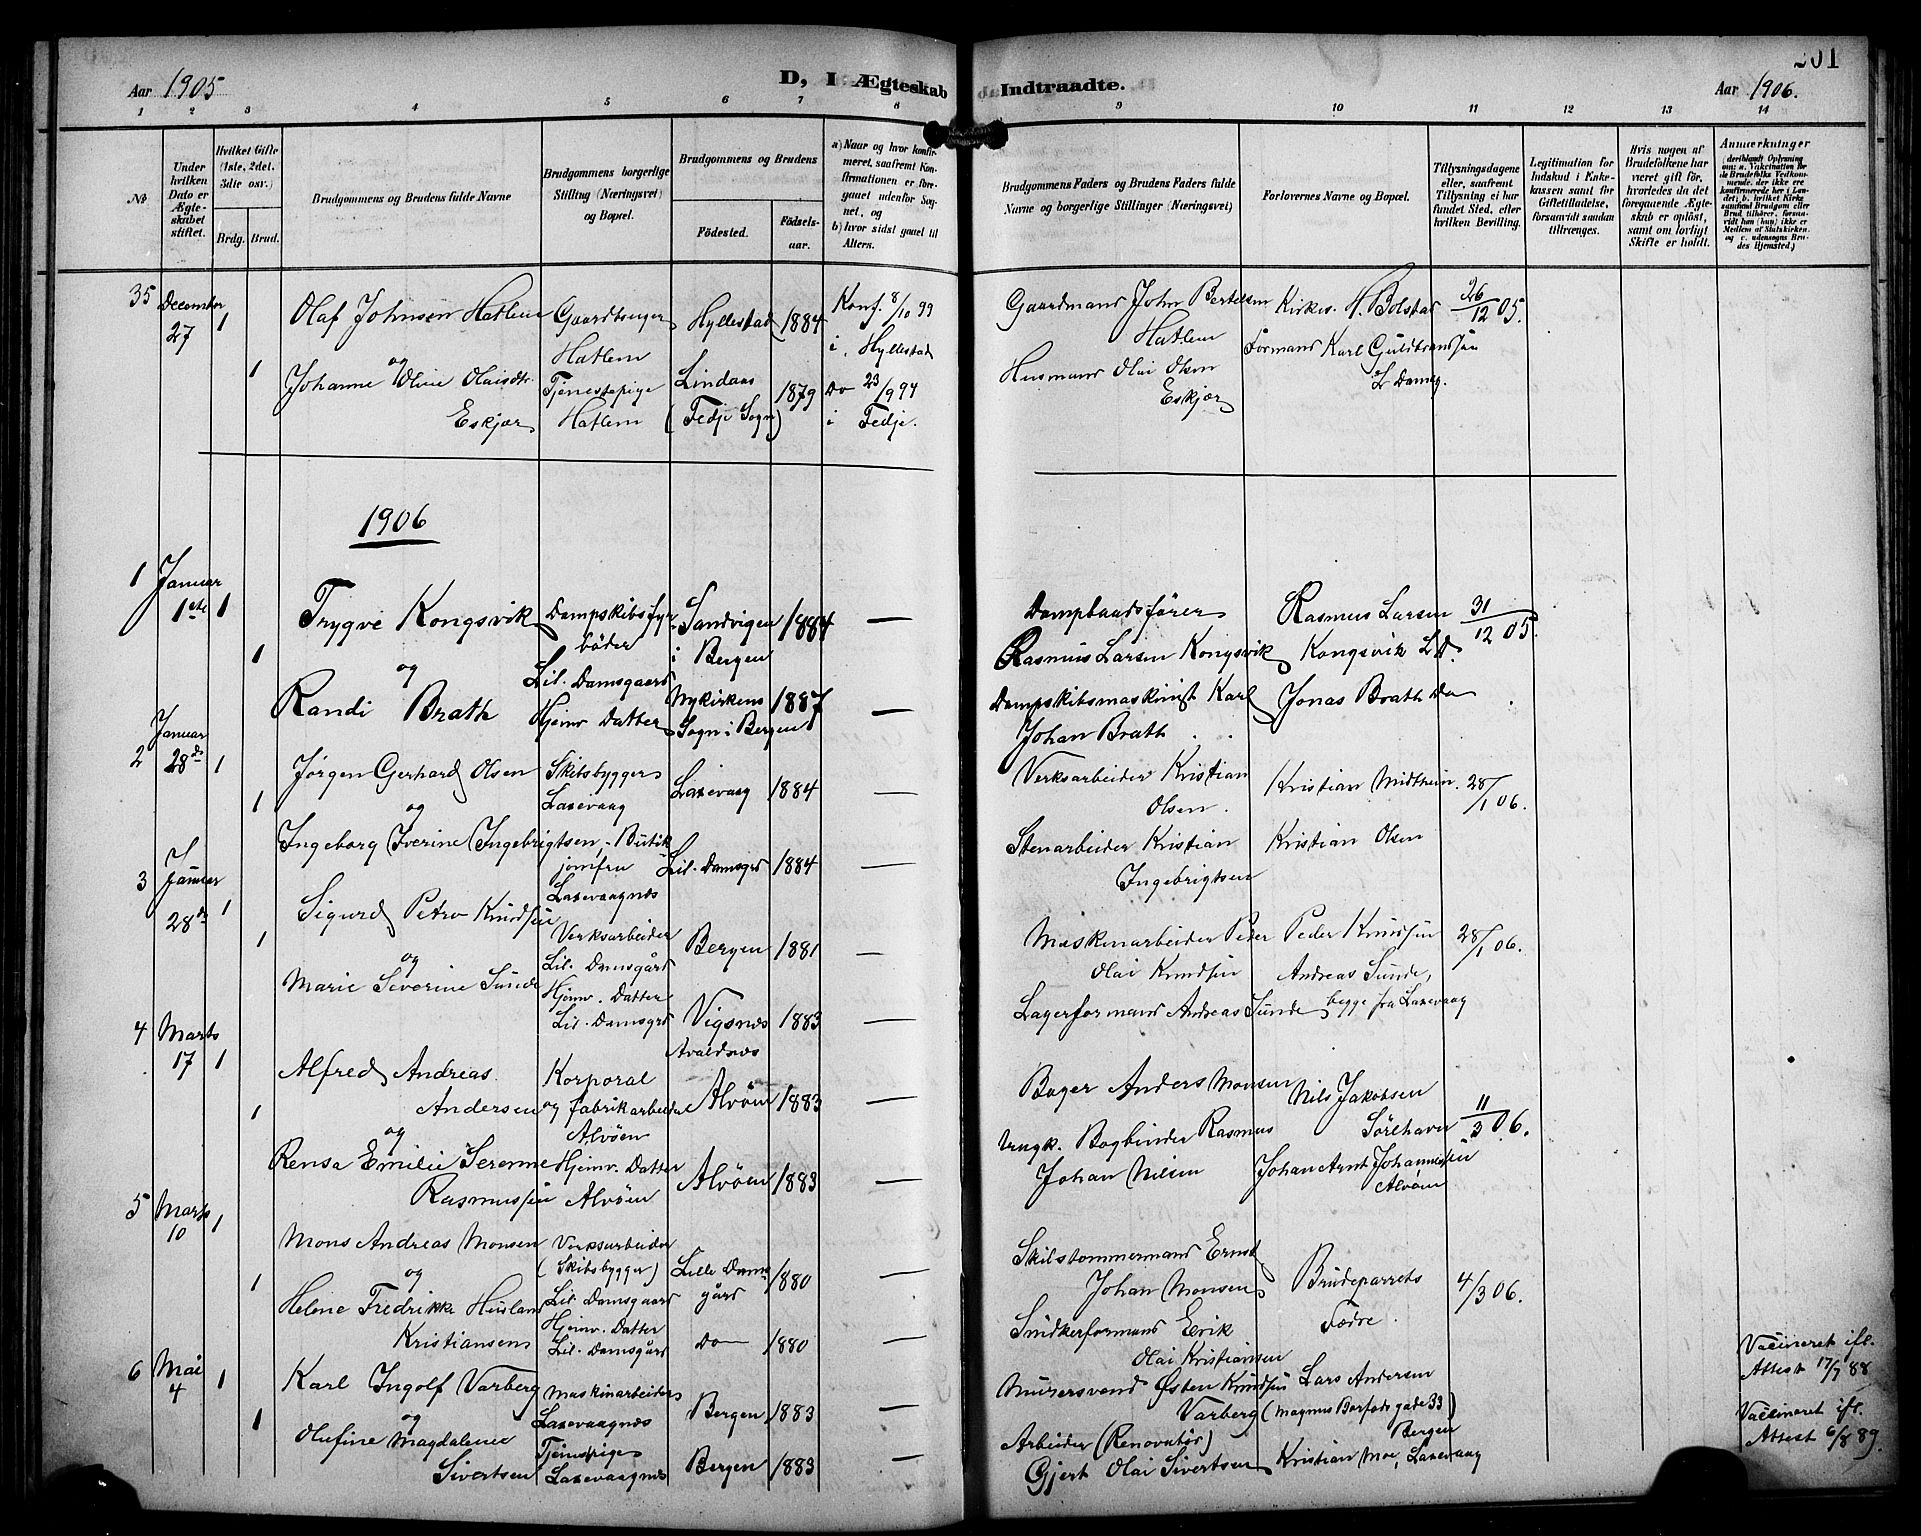 SAB, Laksevåg Sokneprestembete, H/Ha/Hab/Haba/L0004: Klokkerbok nr. A 4, 1899-1909, s. 201